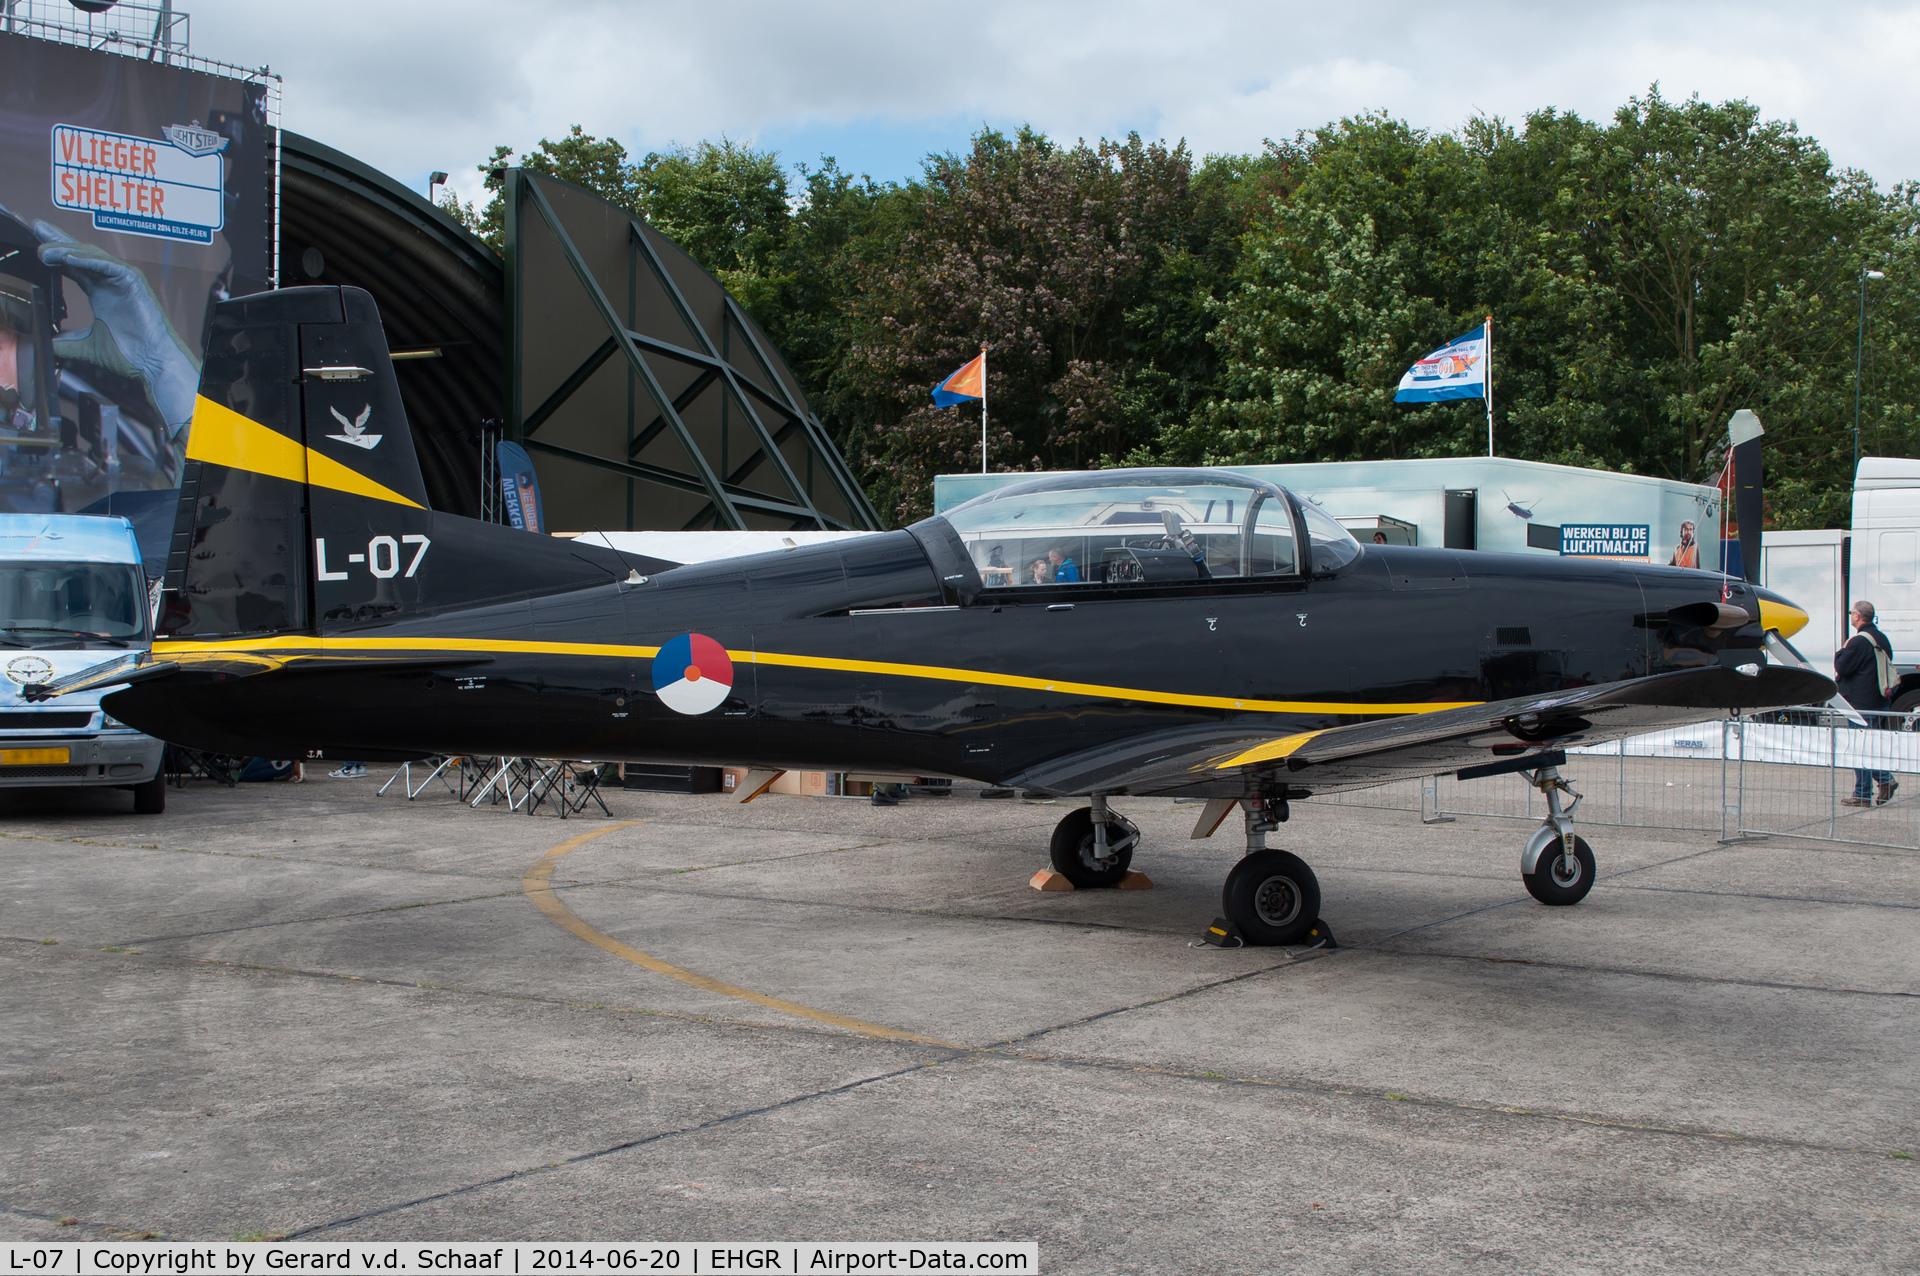 L-07, Pilatus PC-7 Turbo Trainer C/N 544, Gilze-Rijen, June 2014